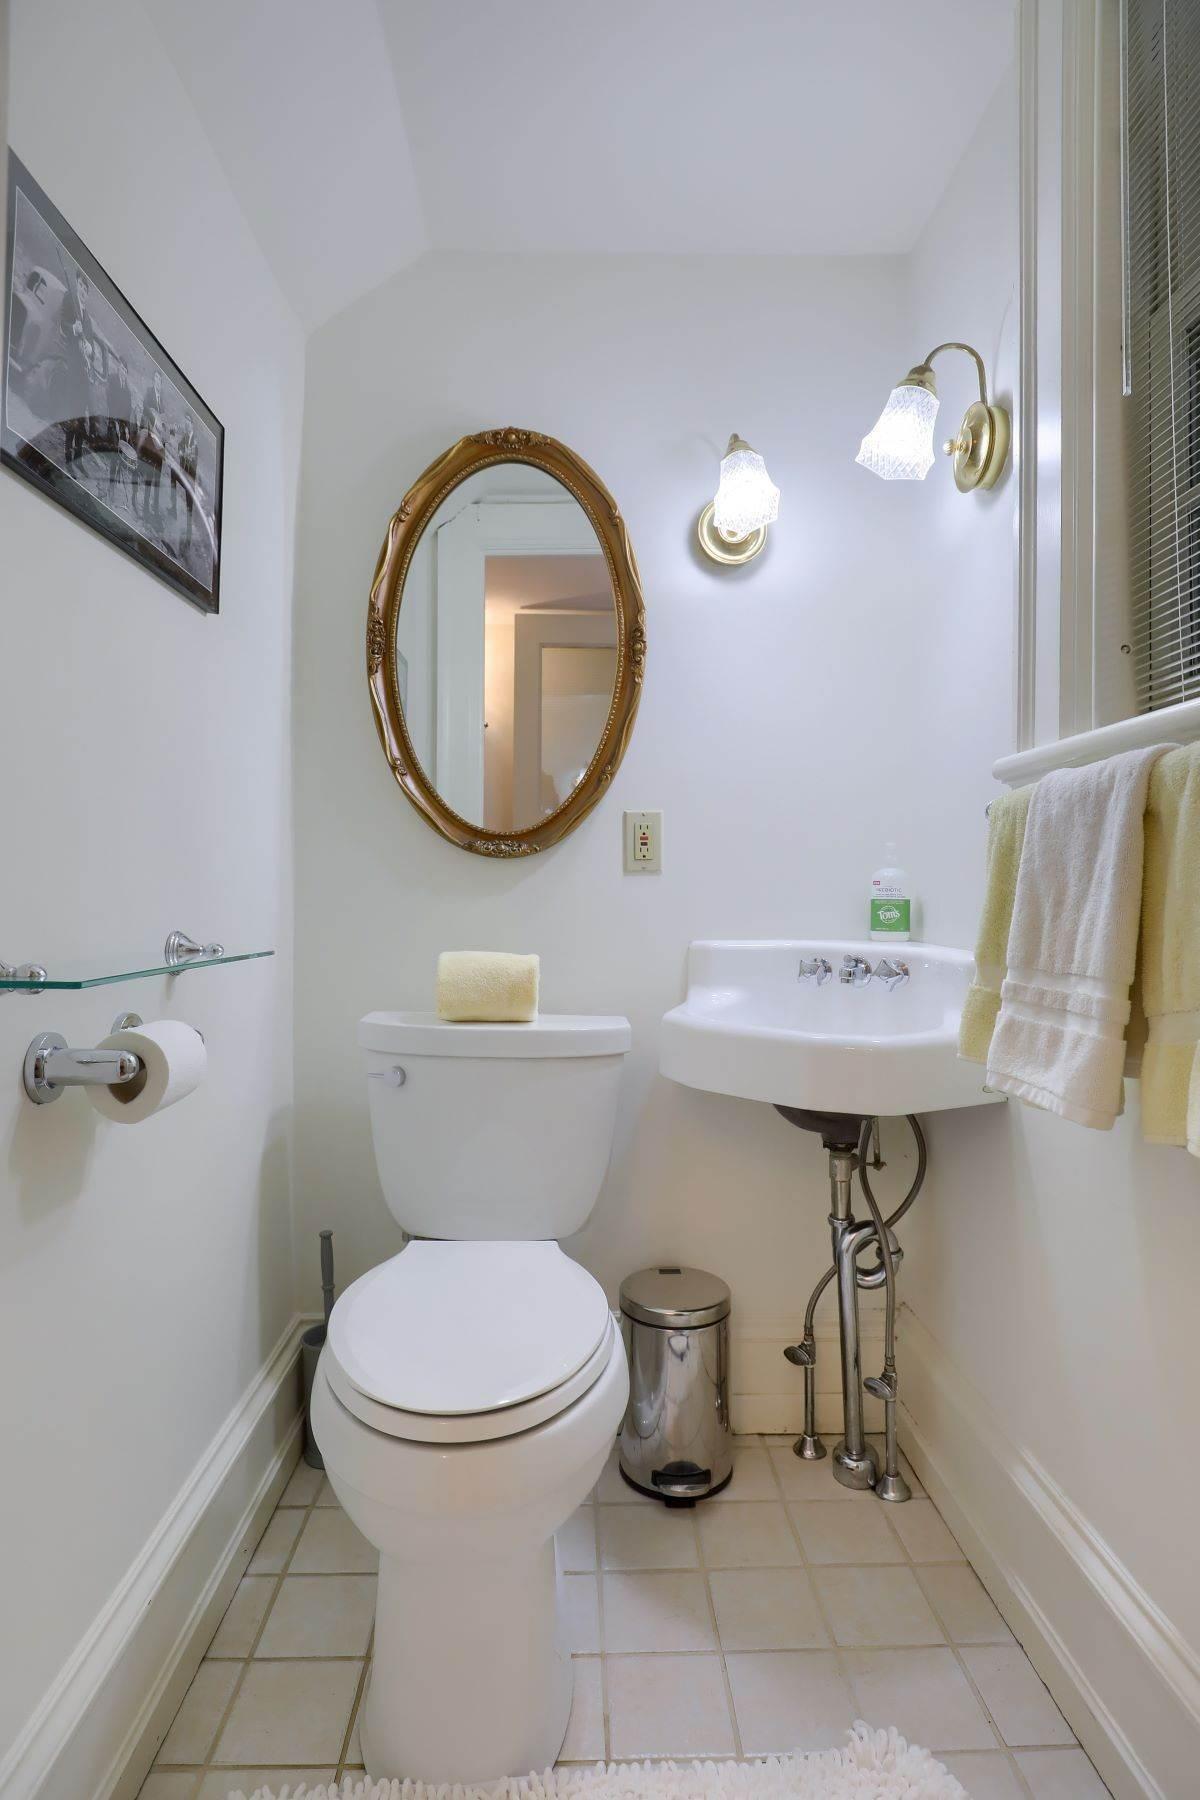 23. Single Family Homes for Sale at 206 E Granada Ave Hershey, Pennsylvania 17033 United States